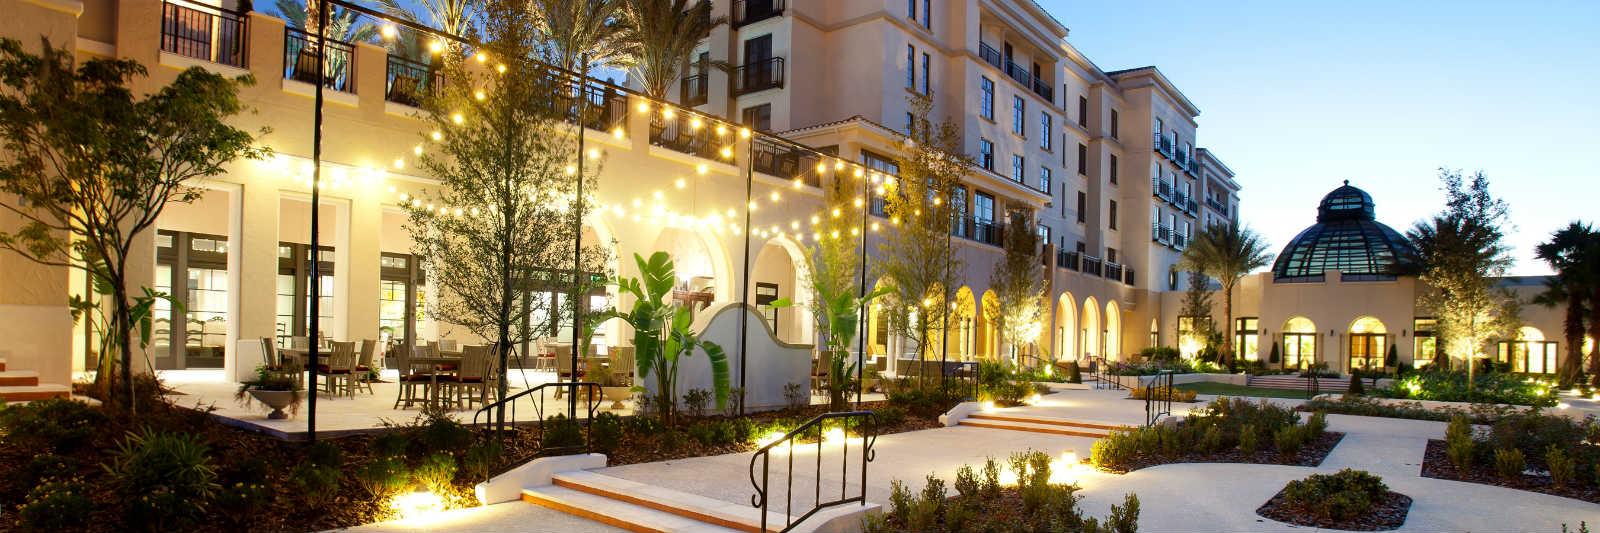 hotel-lights.jpg